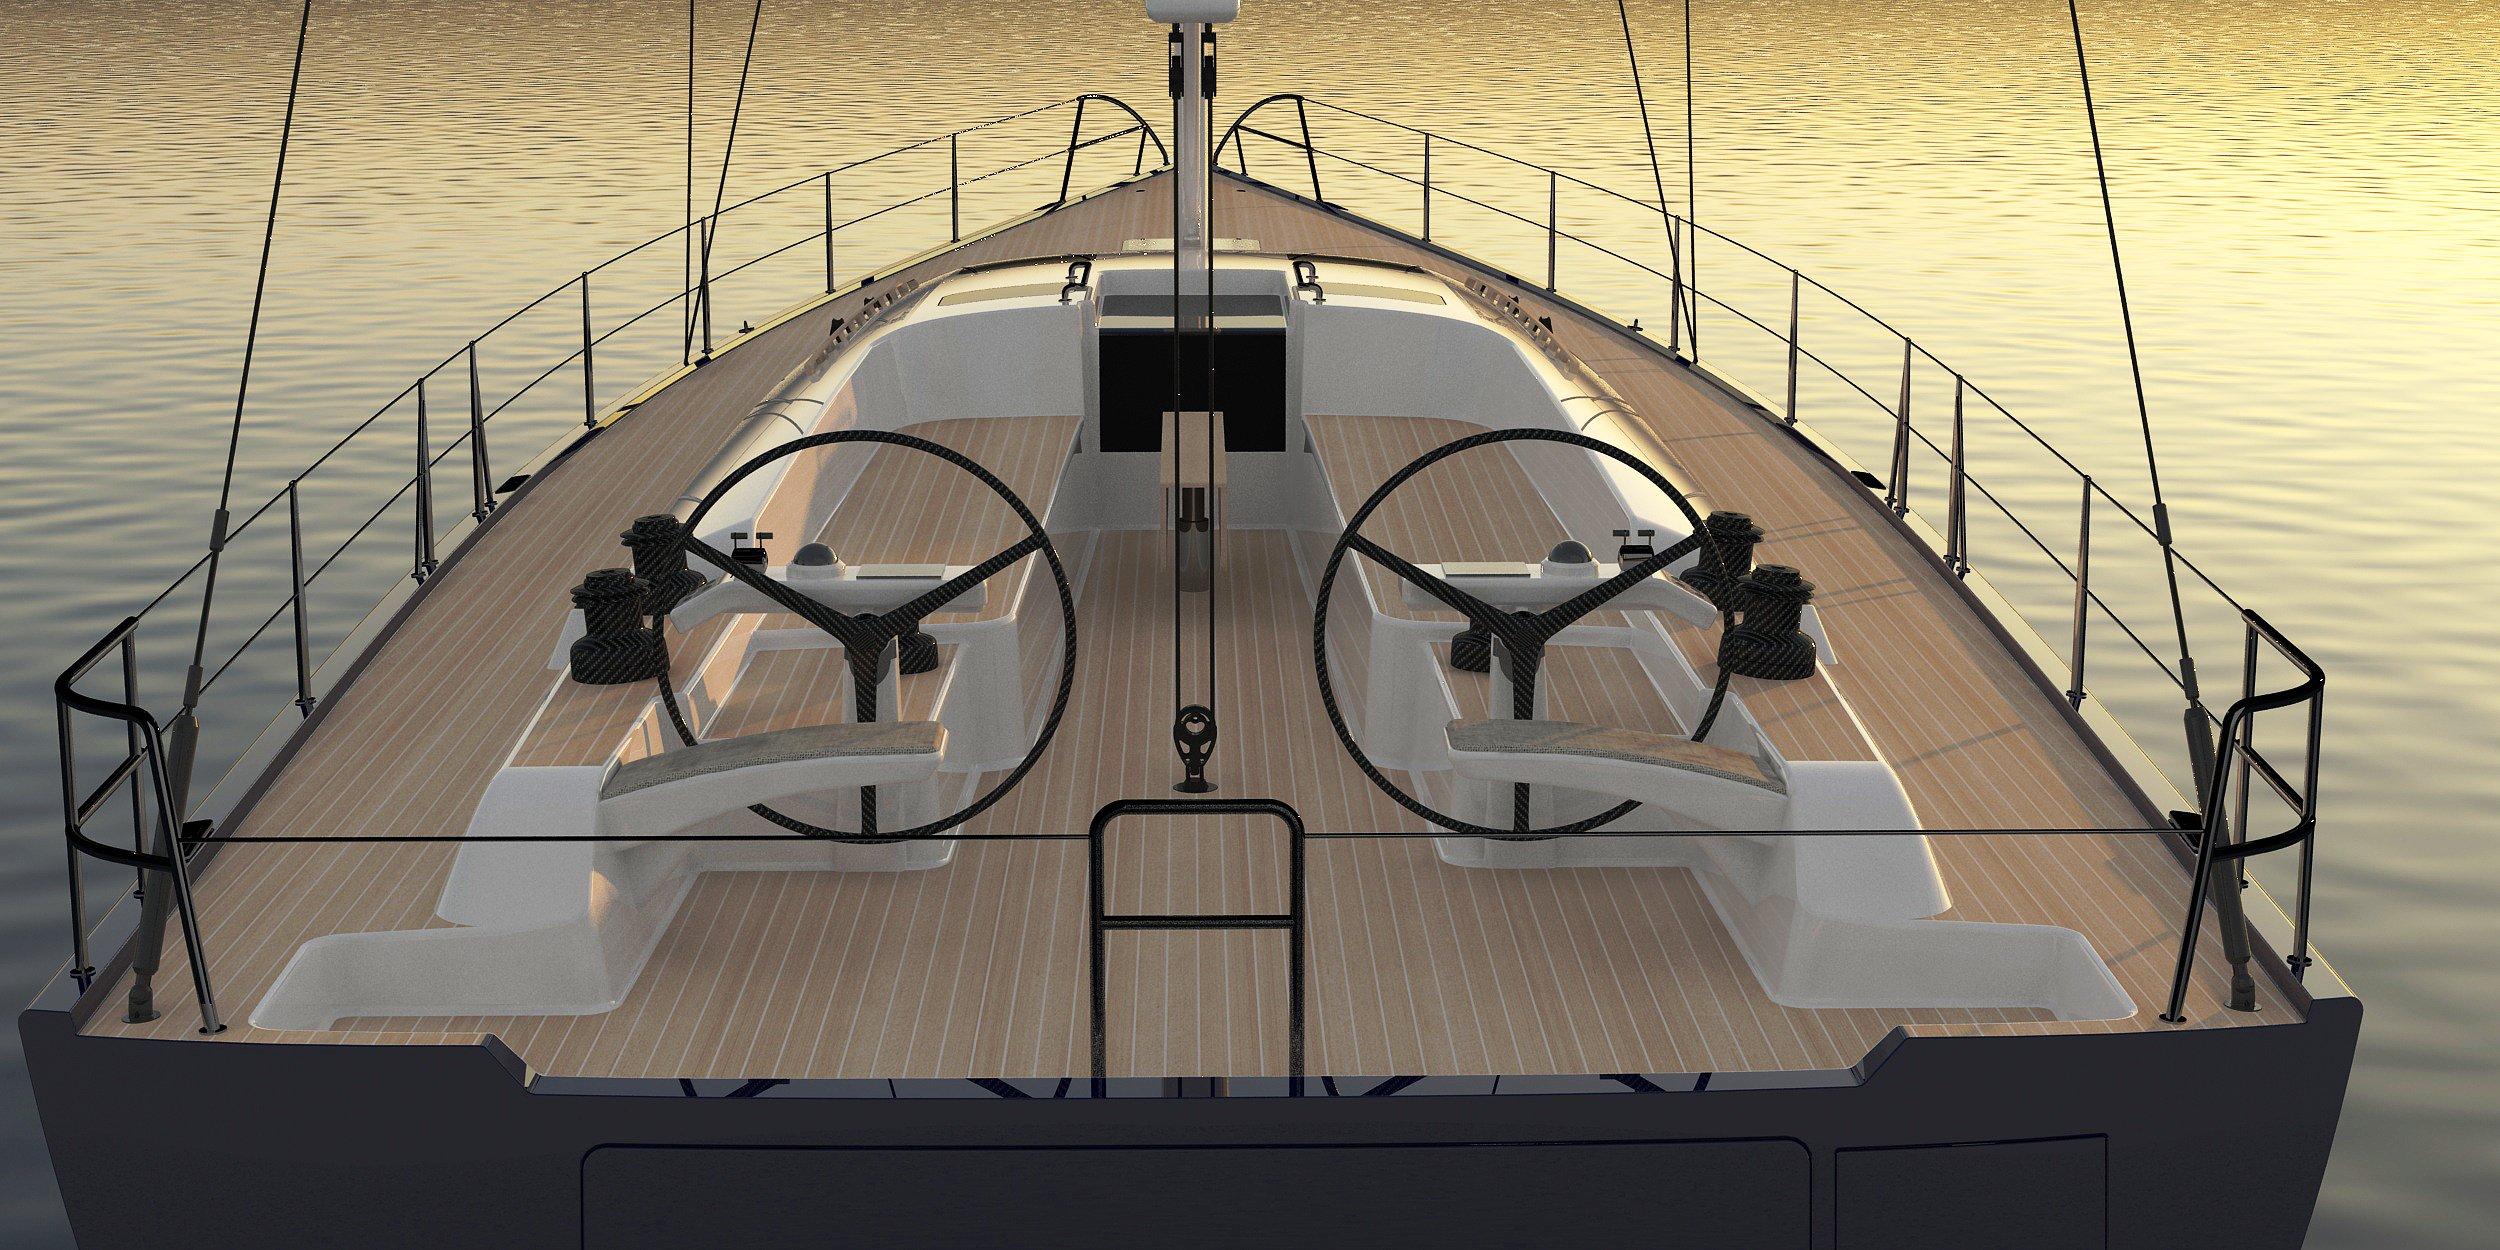 Hylas 60 Forward Stateroom cockpit configuration